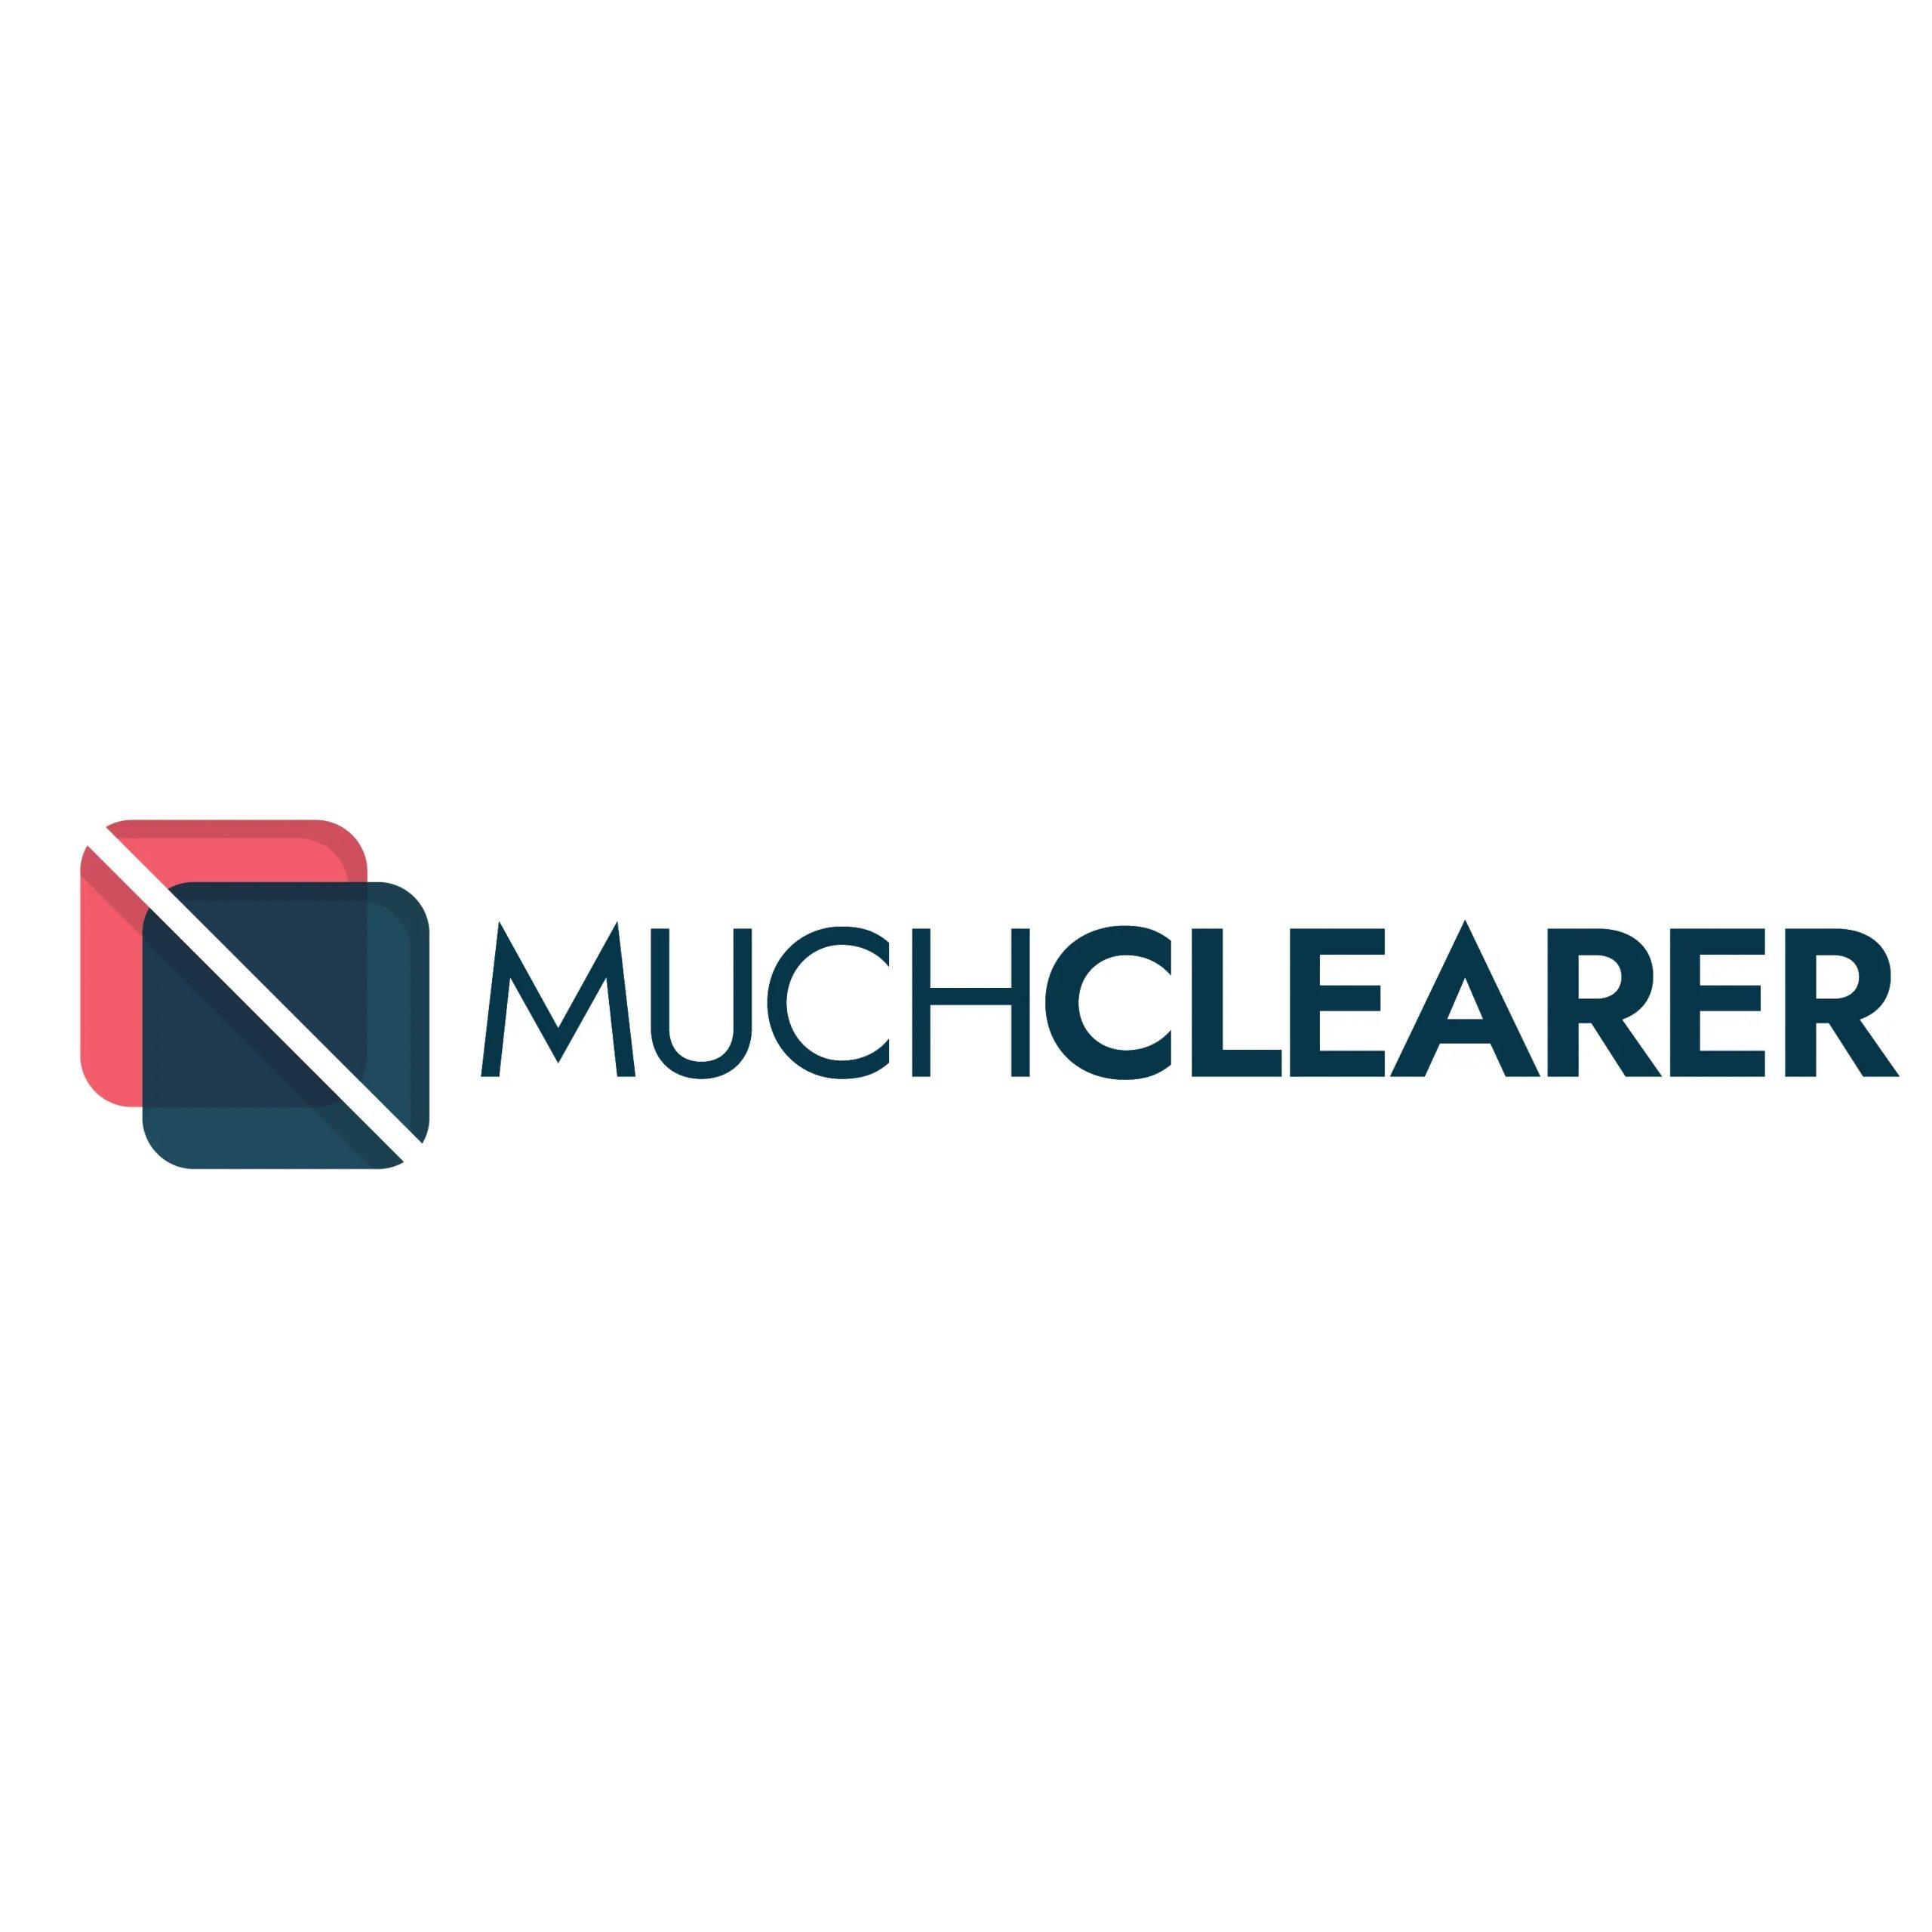 muchclearer logo